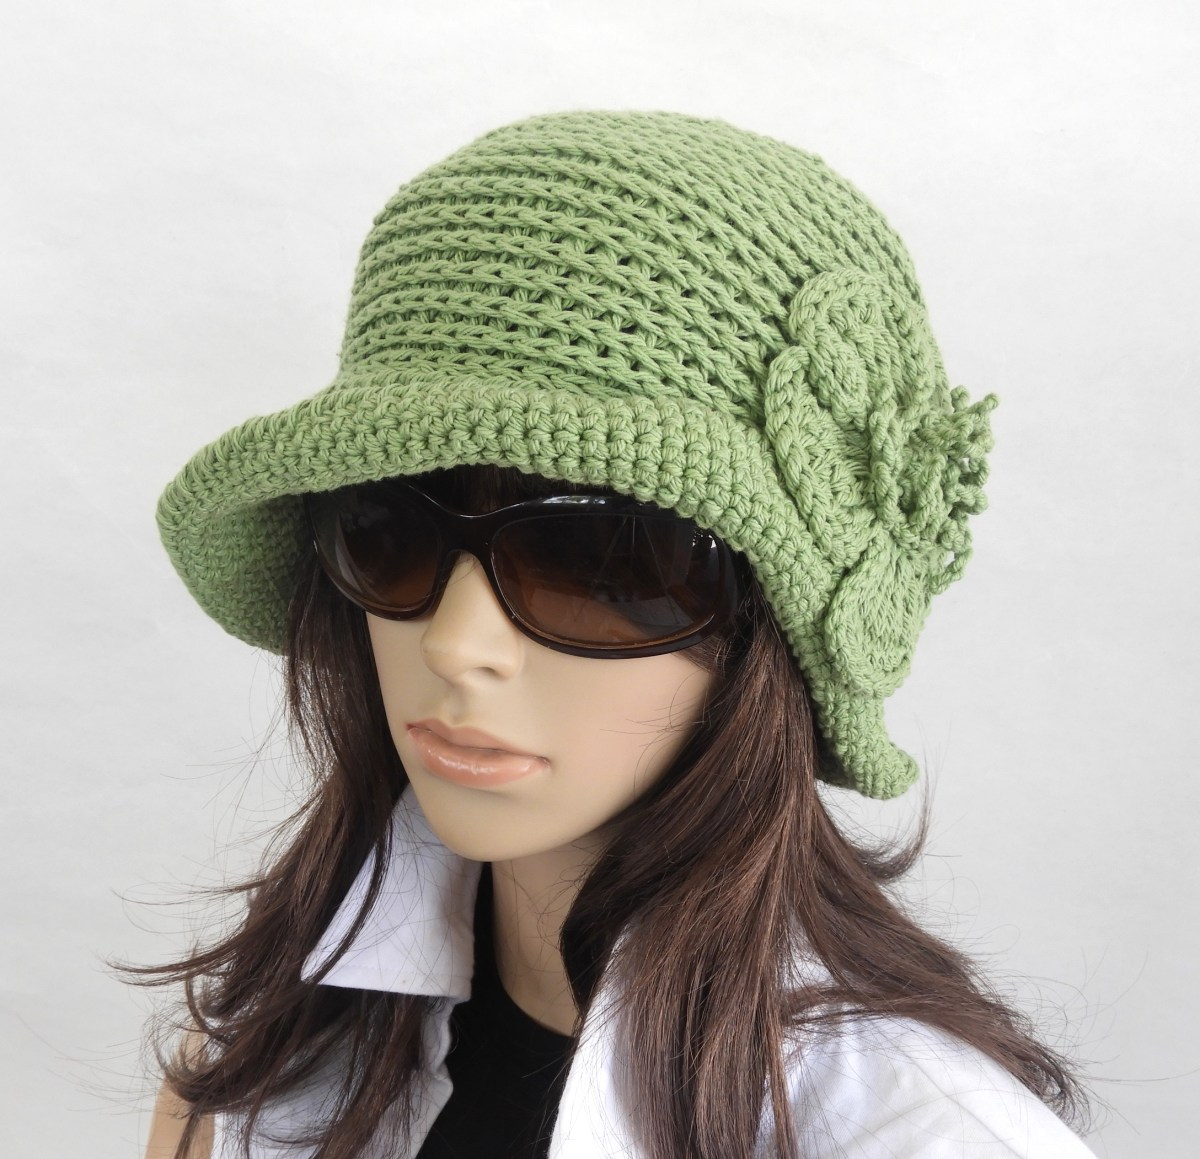 My summer crochet cloche/hat collection.